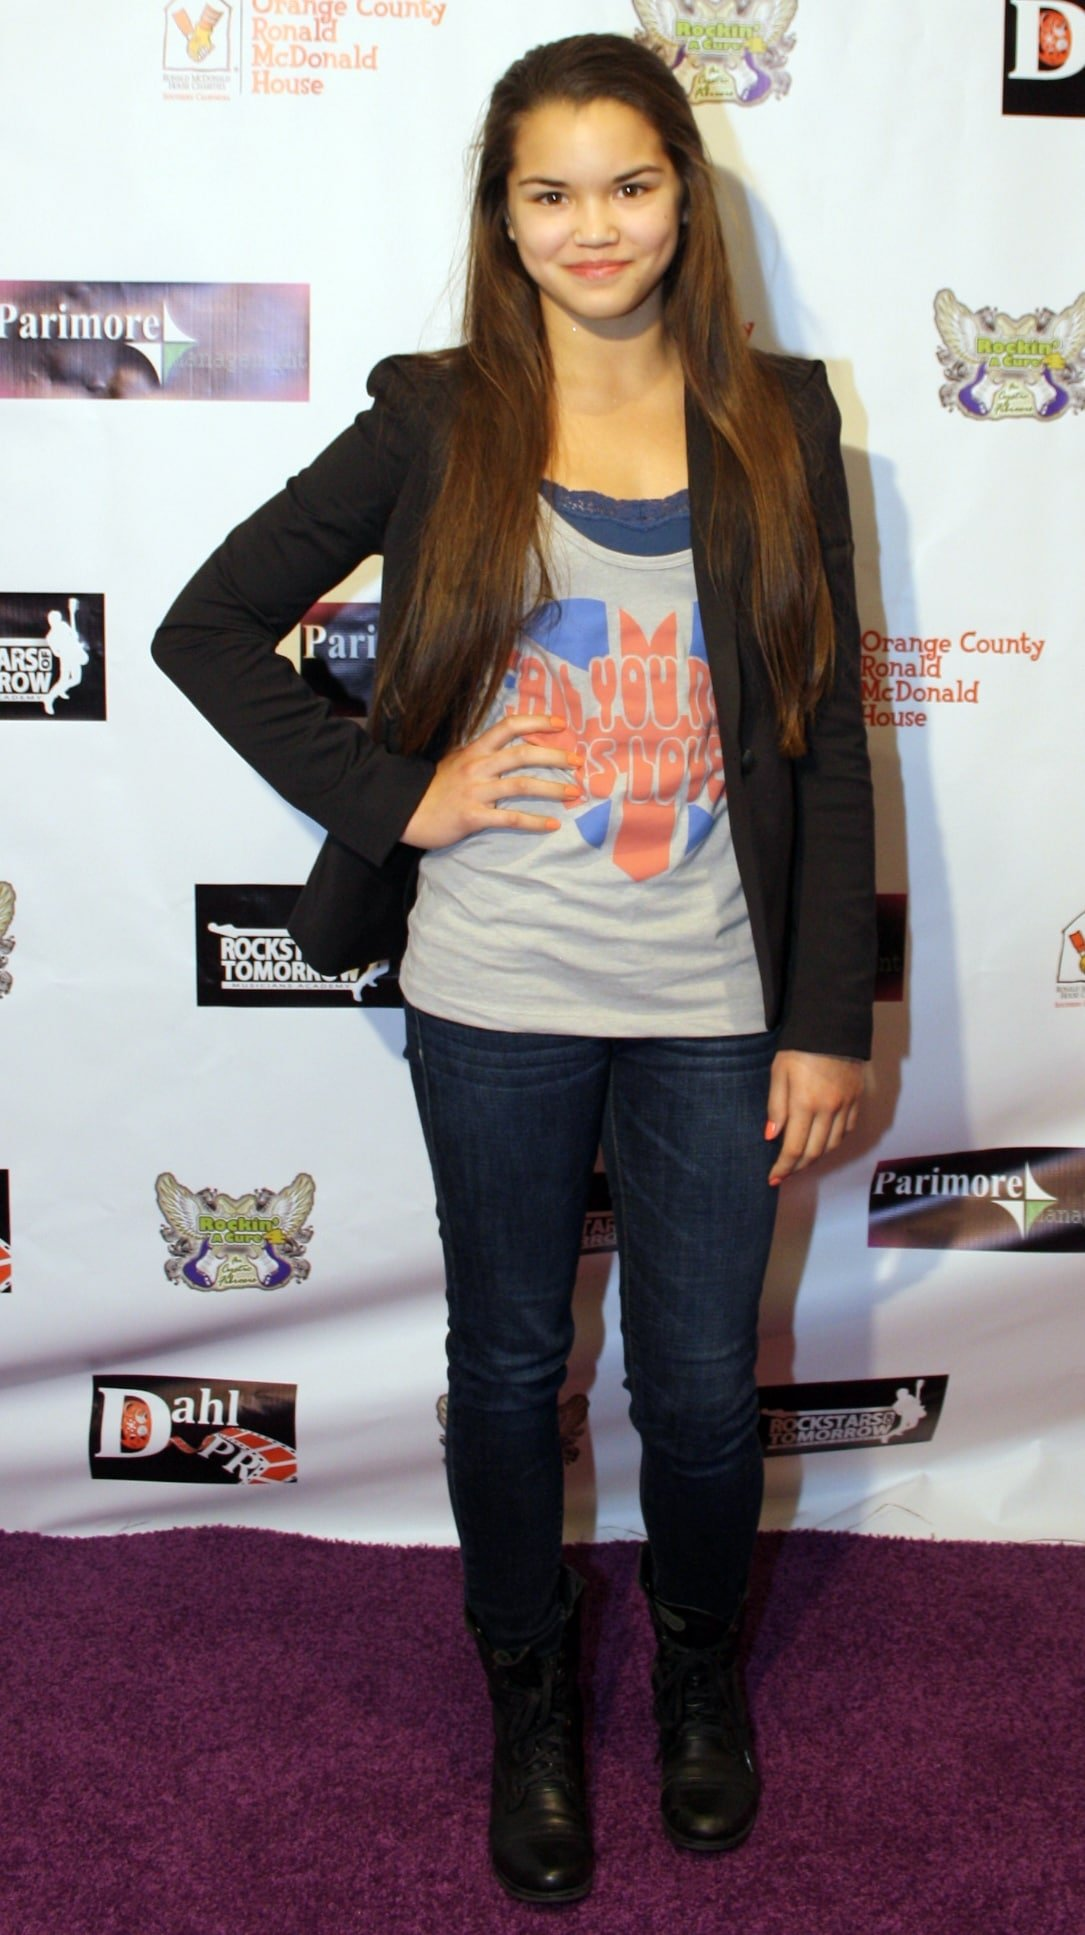 Paris Berelc attends Rockin' A Cure 4 CF in Los Angeles